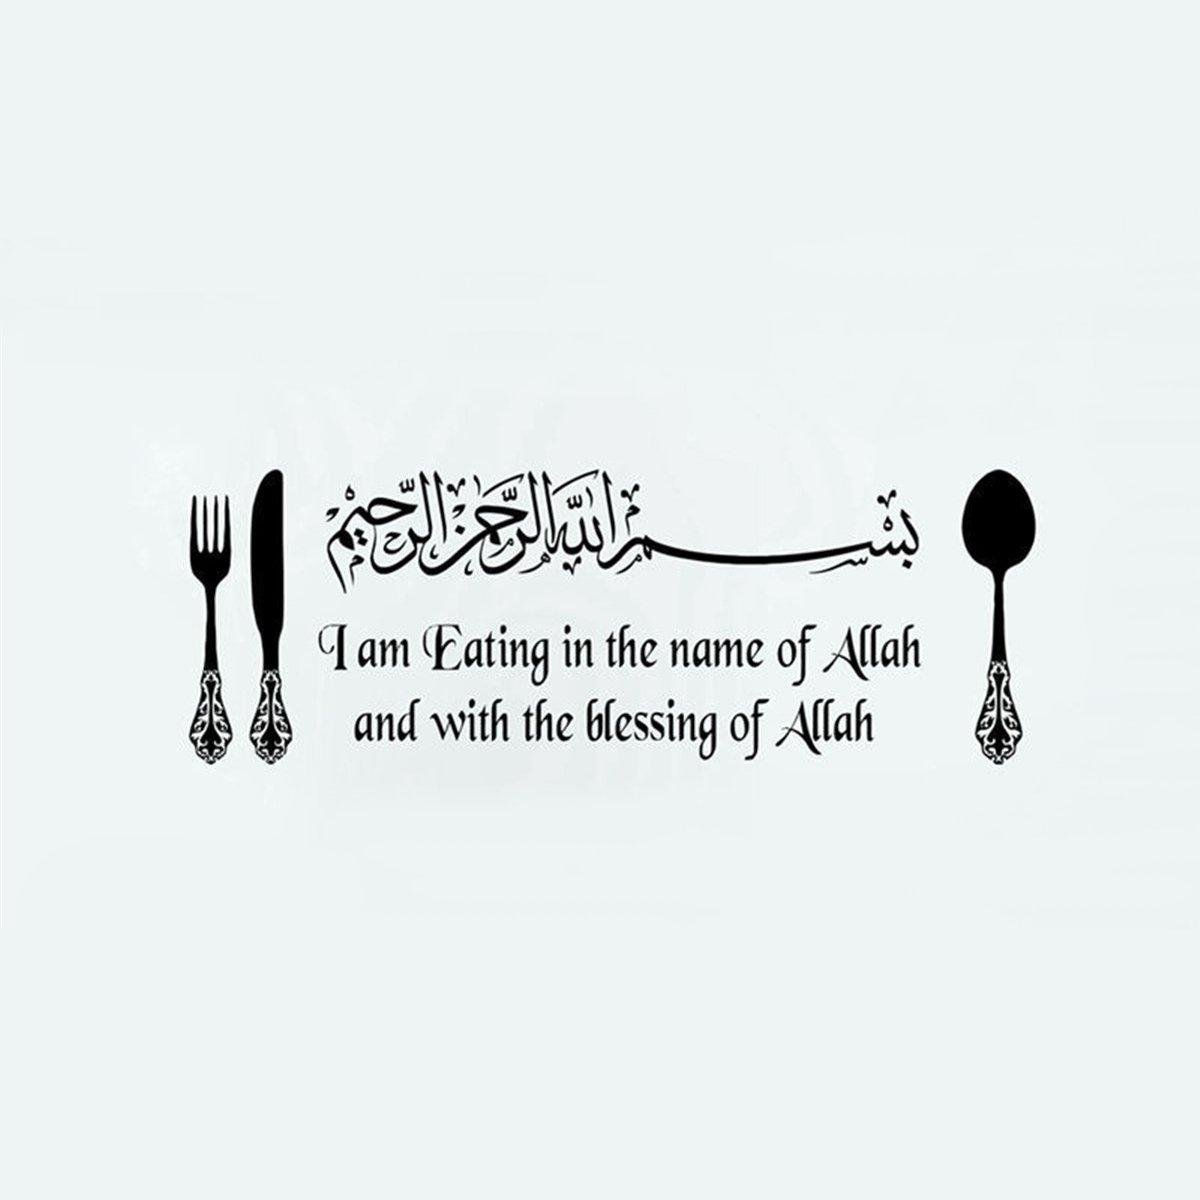 Wandkunst Kalligraphie Aufkleber Islamische Wand Sticker Bismillah Eating Dua